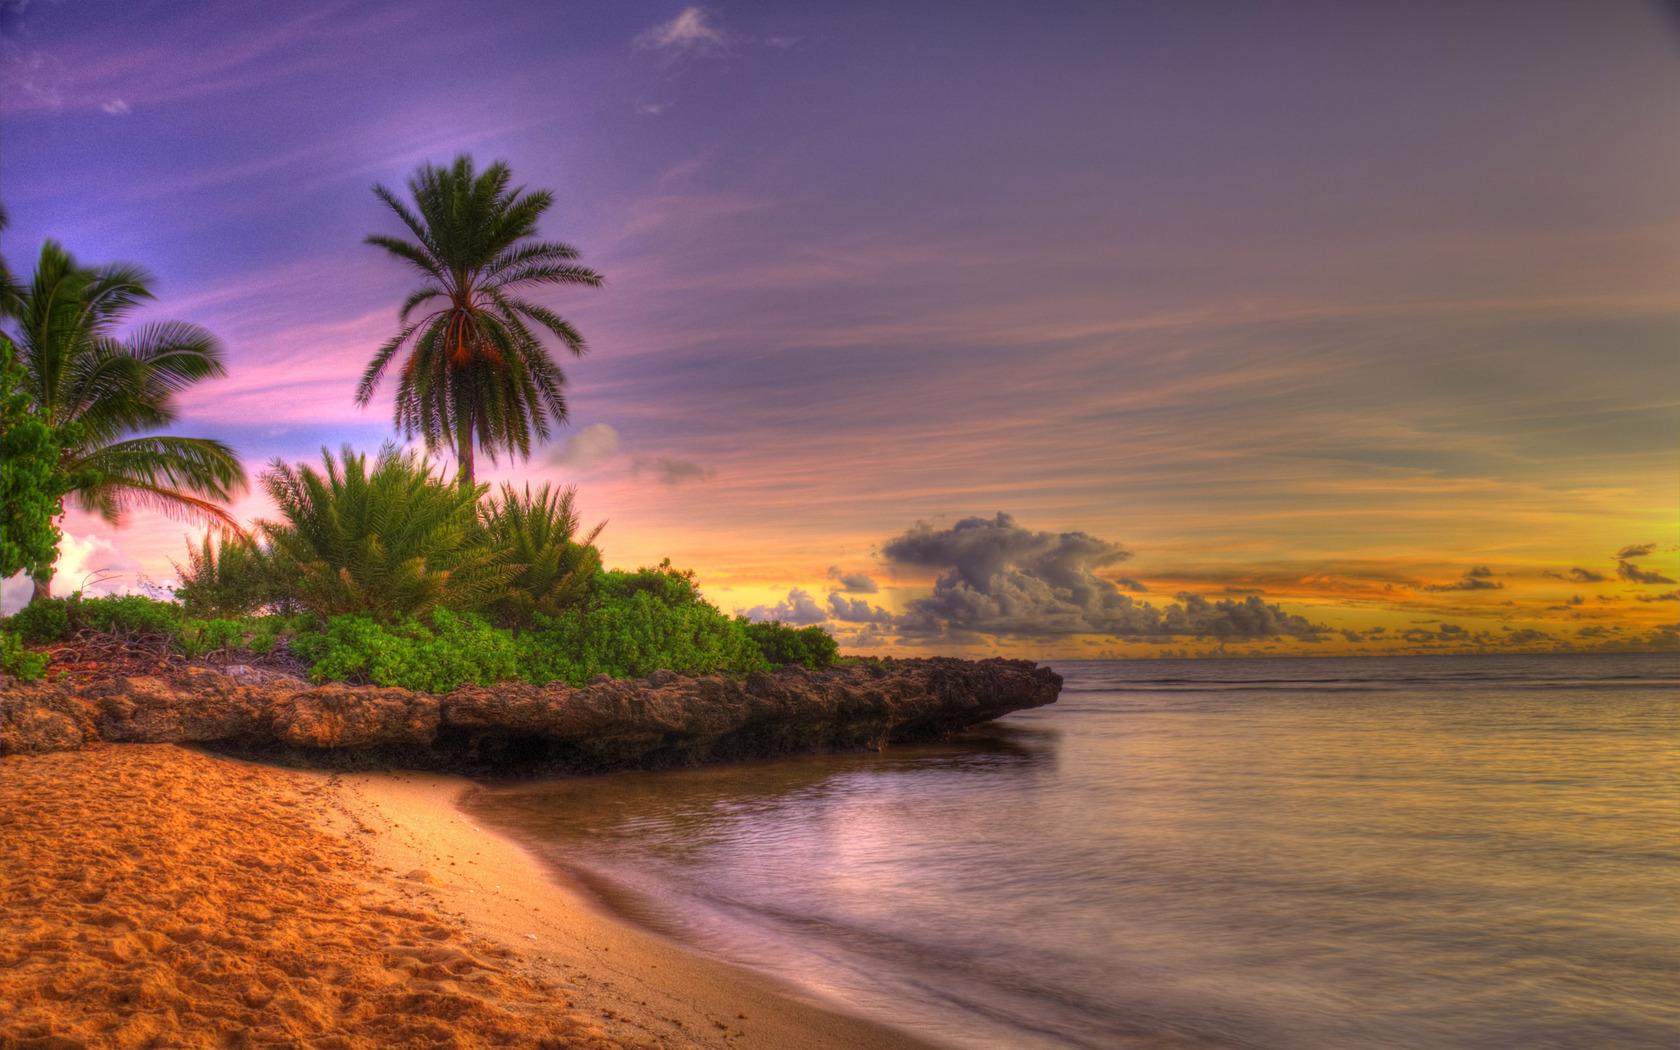 Tropical island wallpaper 16915 1680x1050